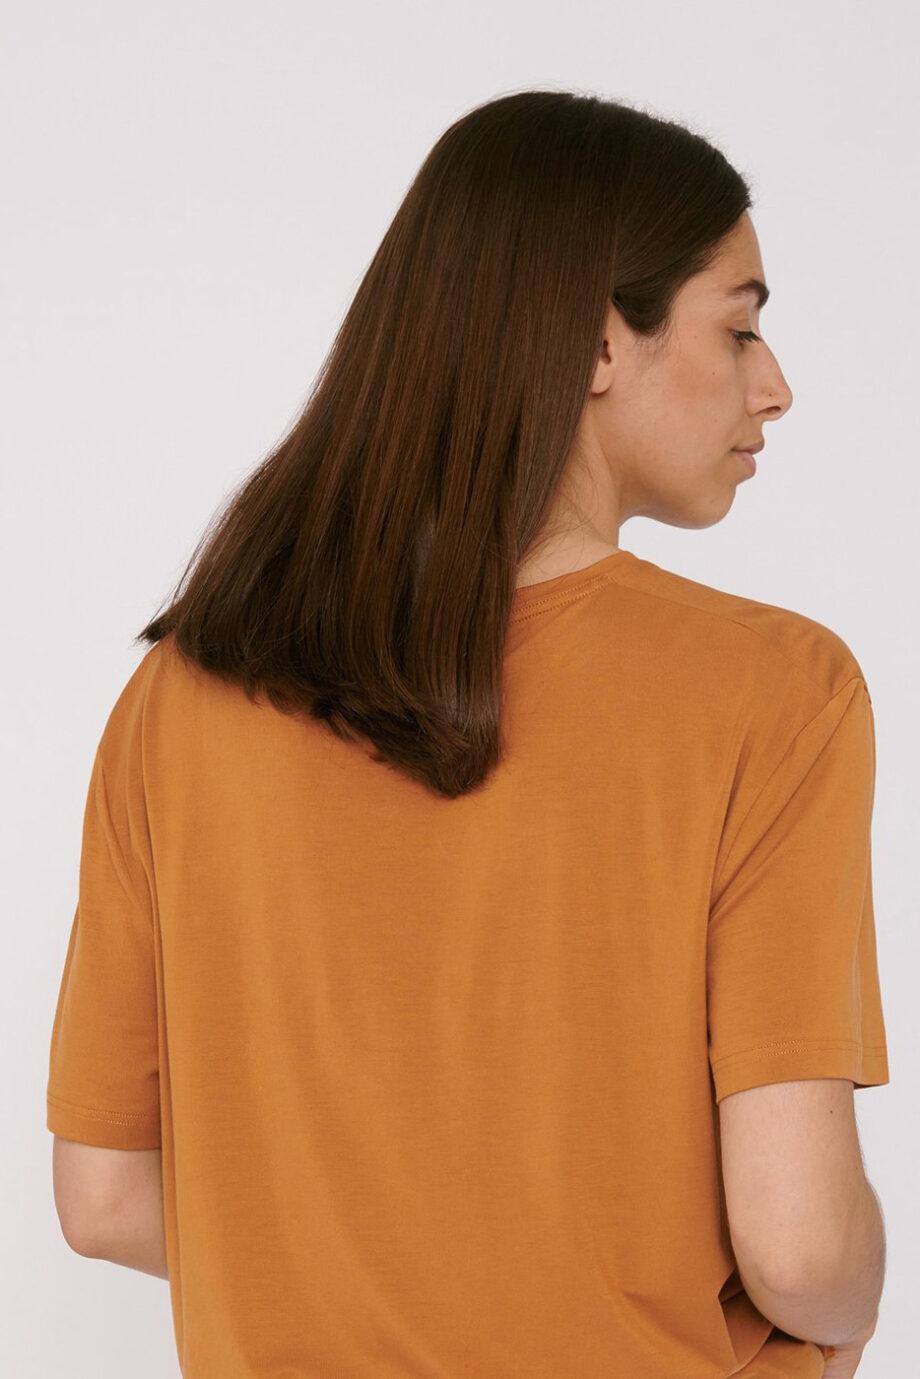 Organic Basics - T-shirt Tencel– geel_fit